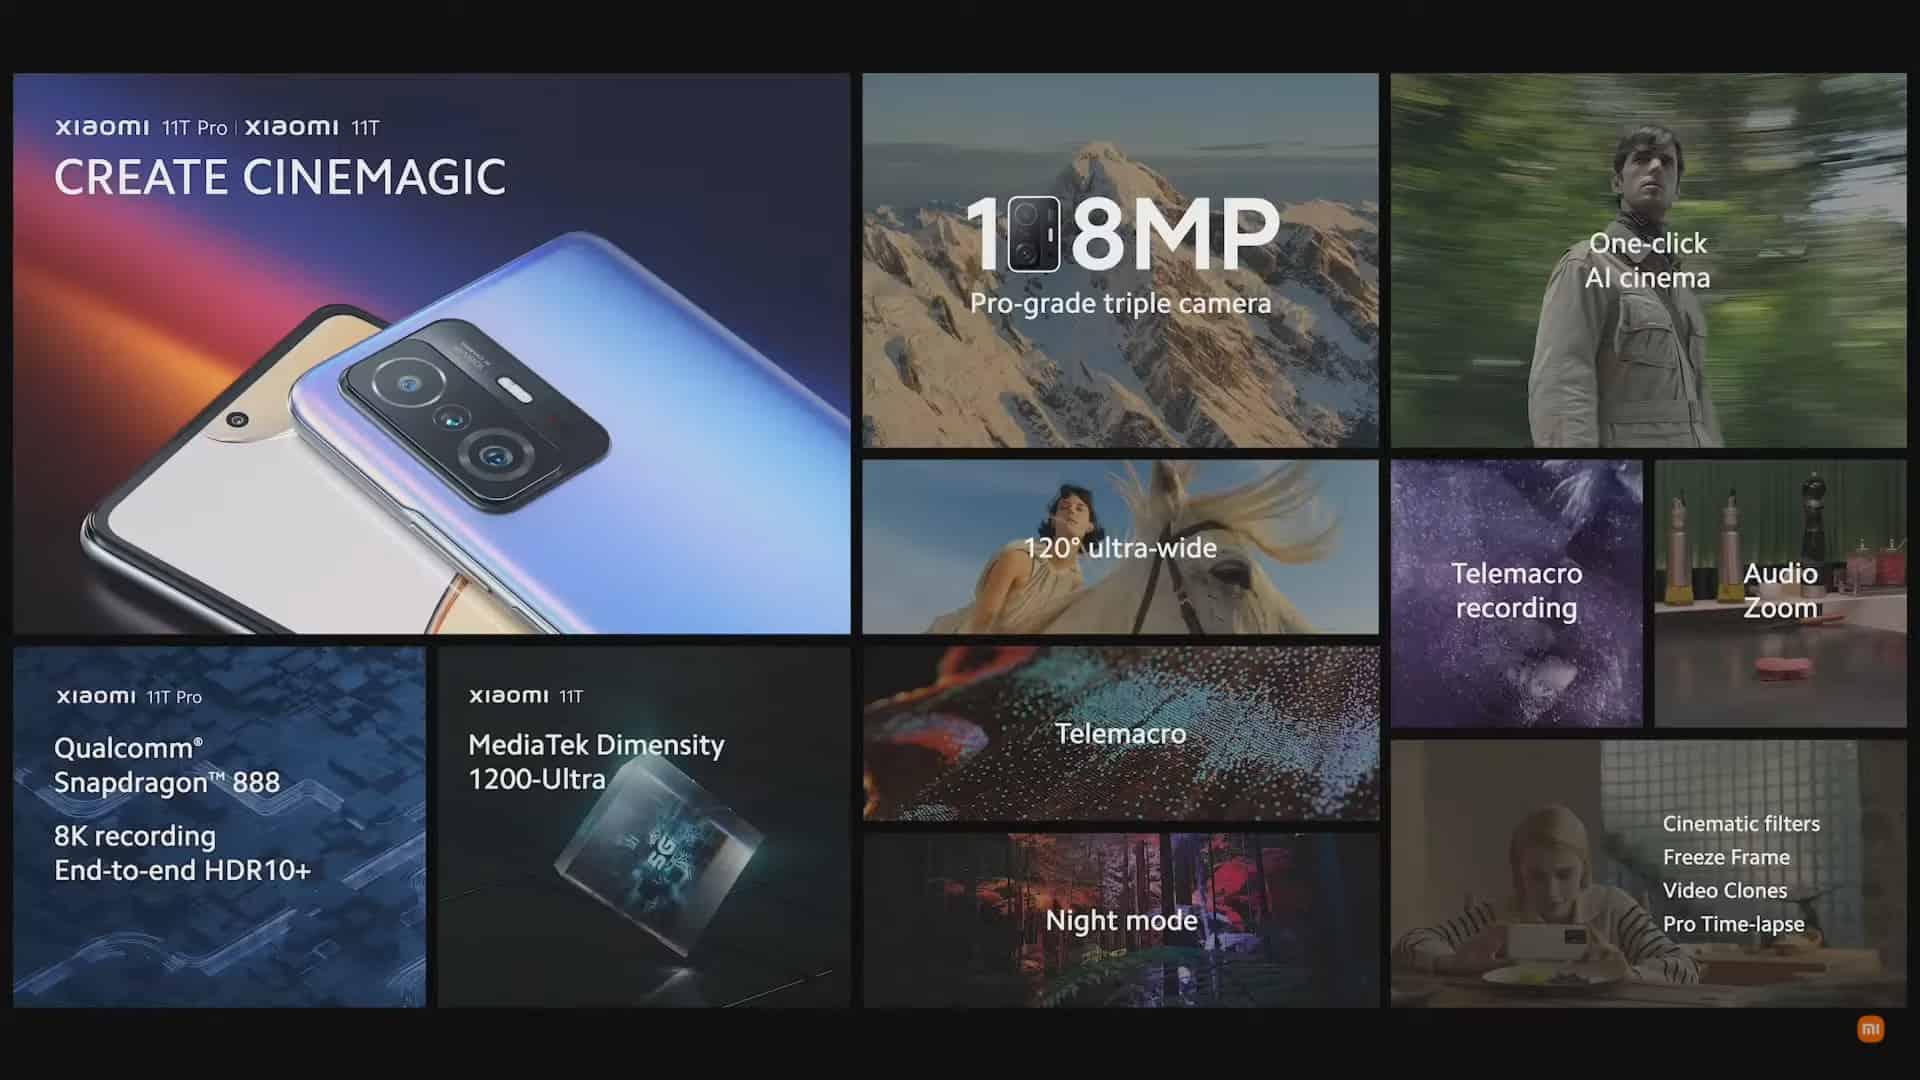 Fitur Cinemagic Xiaomi 11T dan 11T Pro